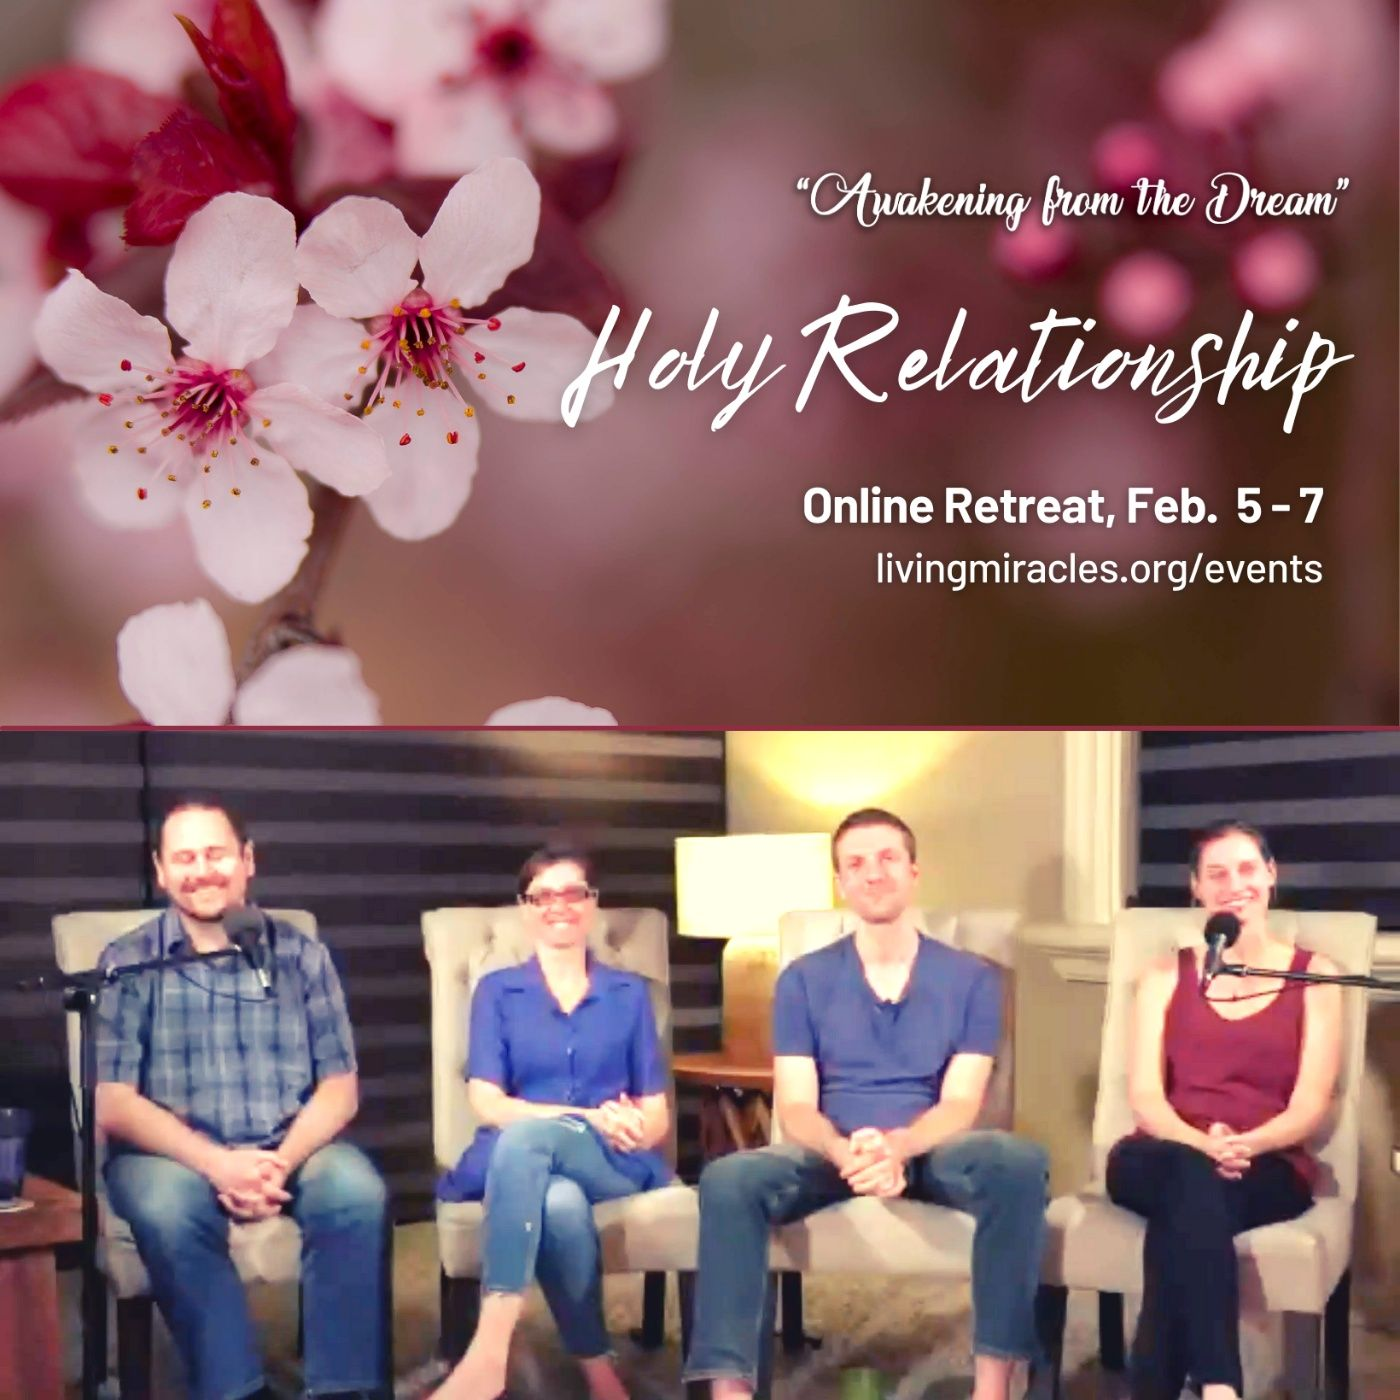 Holy Relationship Panel - Erik Archbold, Susan Huculak, Peter Kirk, Linda van der Velden - Awakening from the Dream Online Weekend Retreat